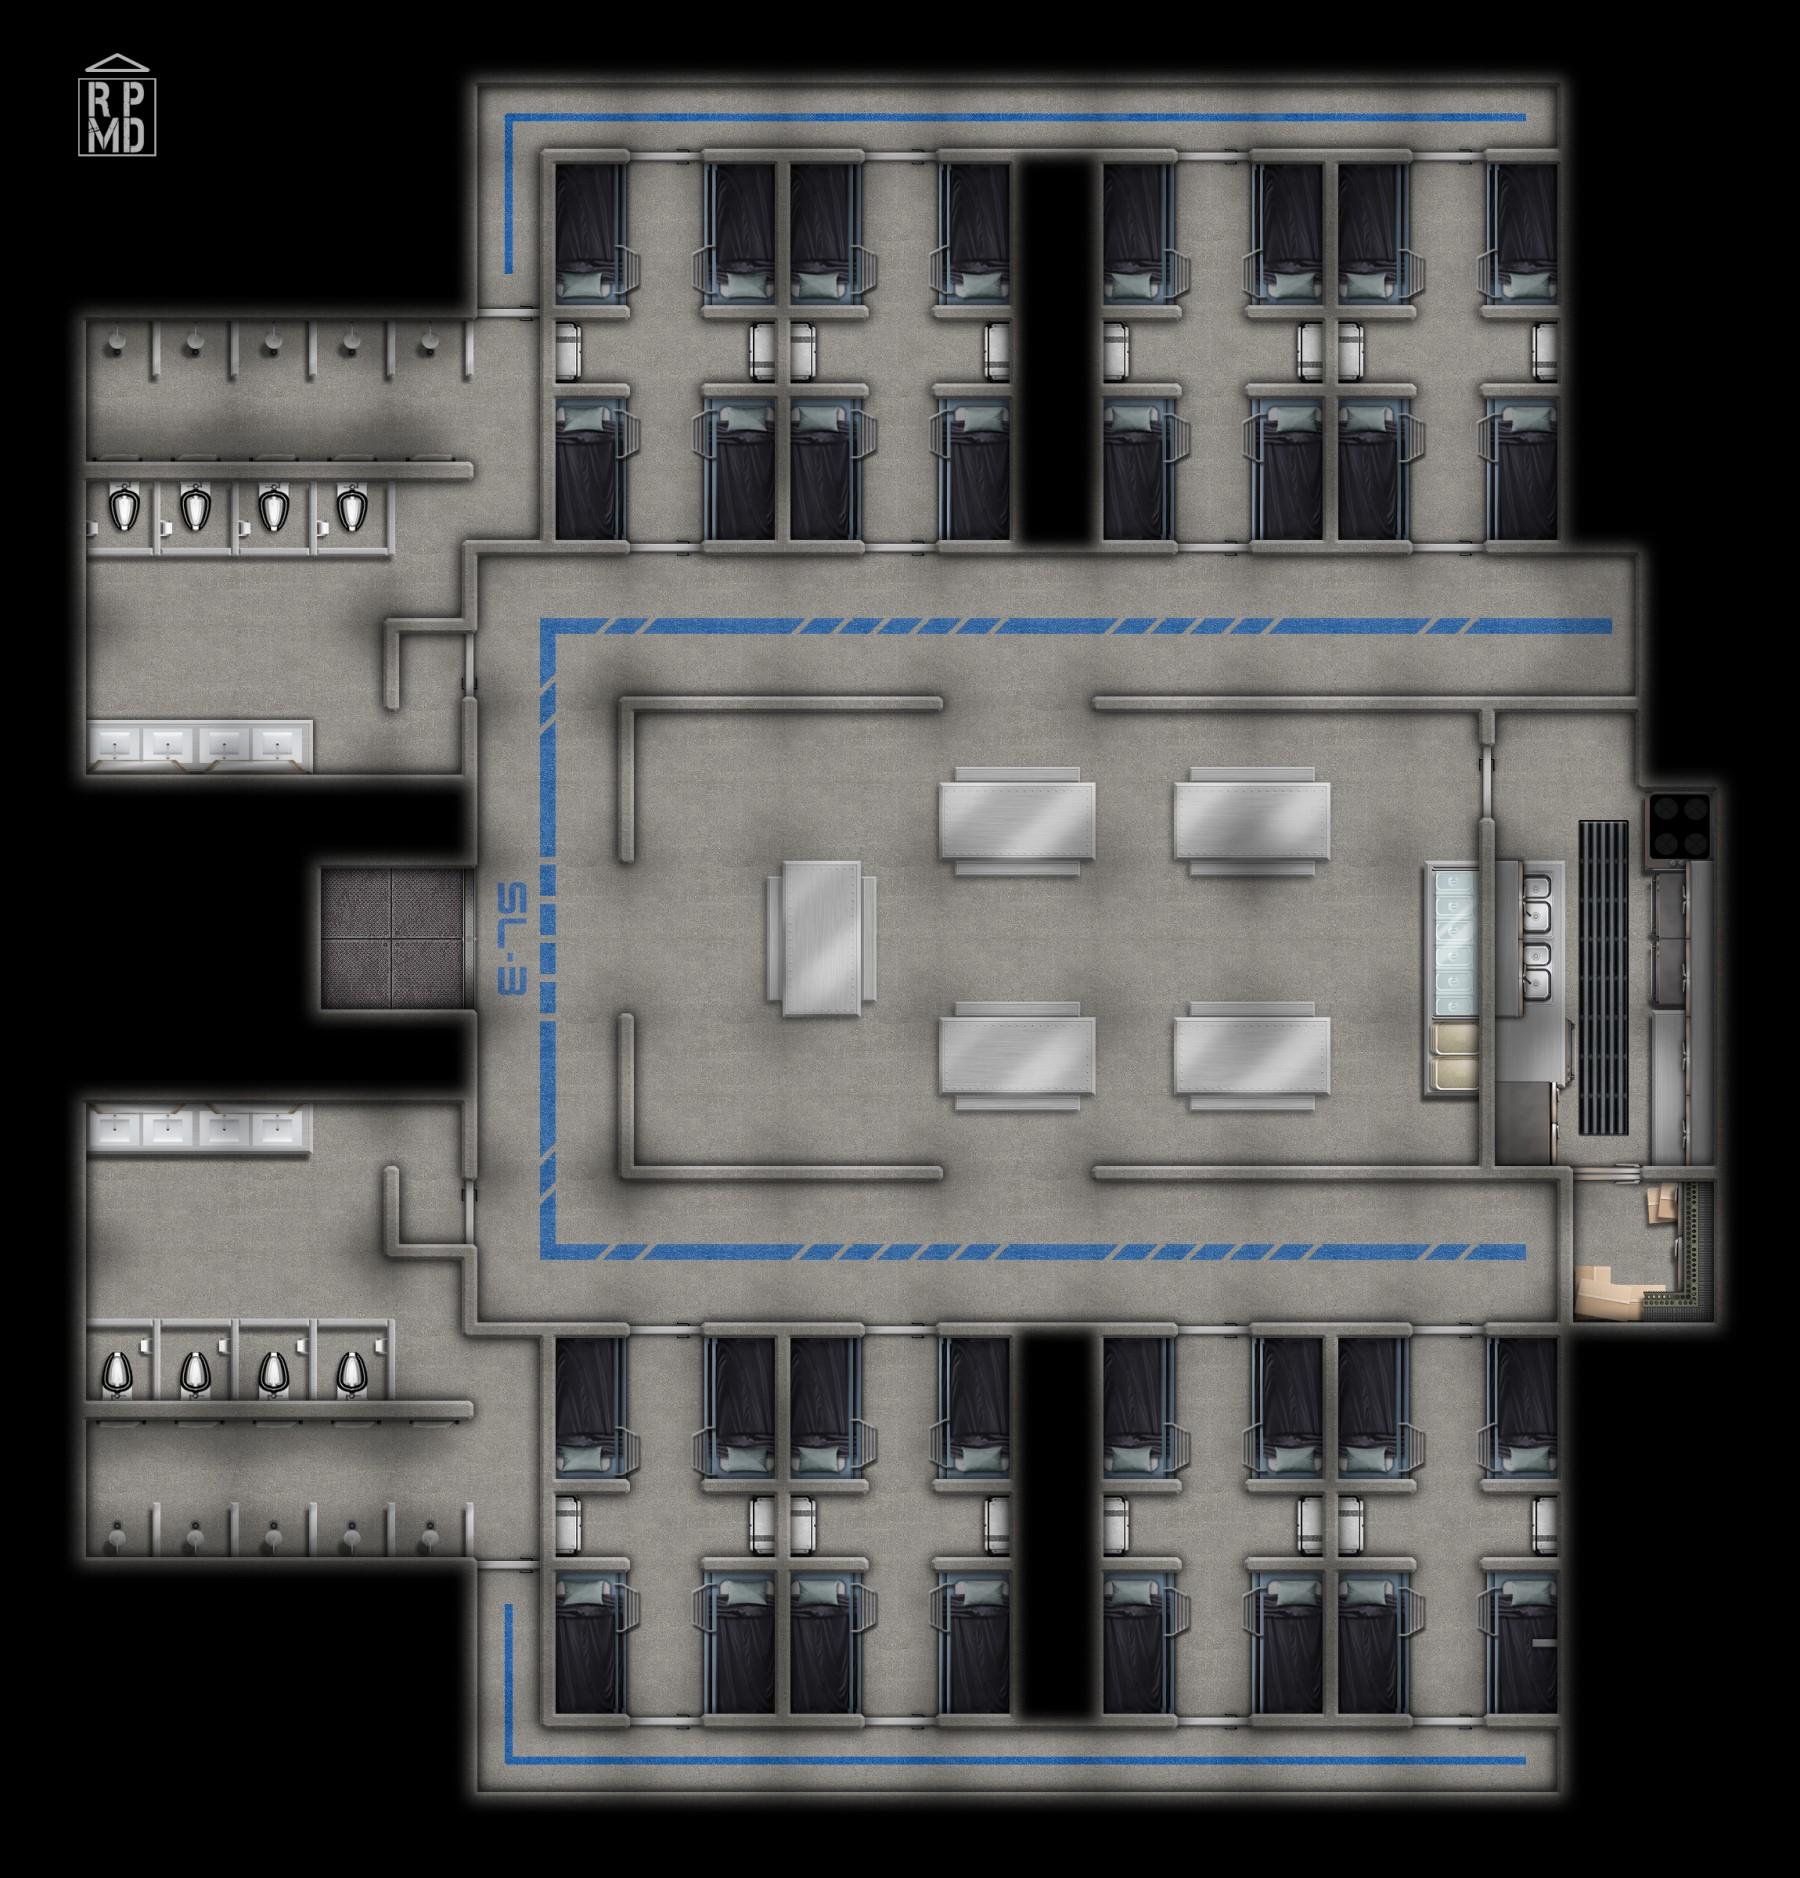 military_bio_research_base__sub_level_3_by_ronpeppermd_de25lem.jpg